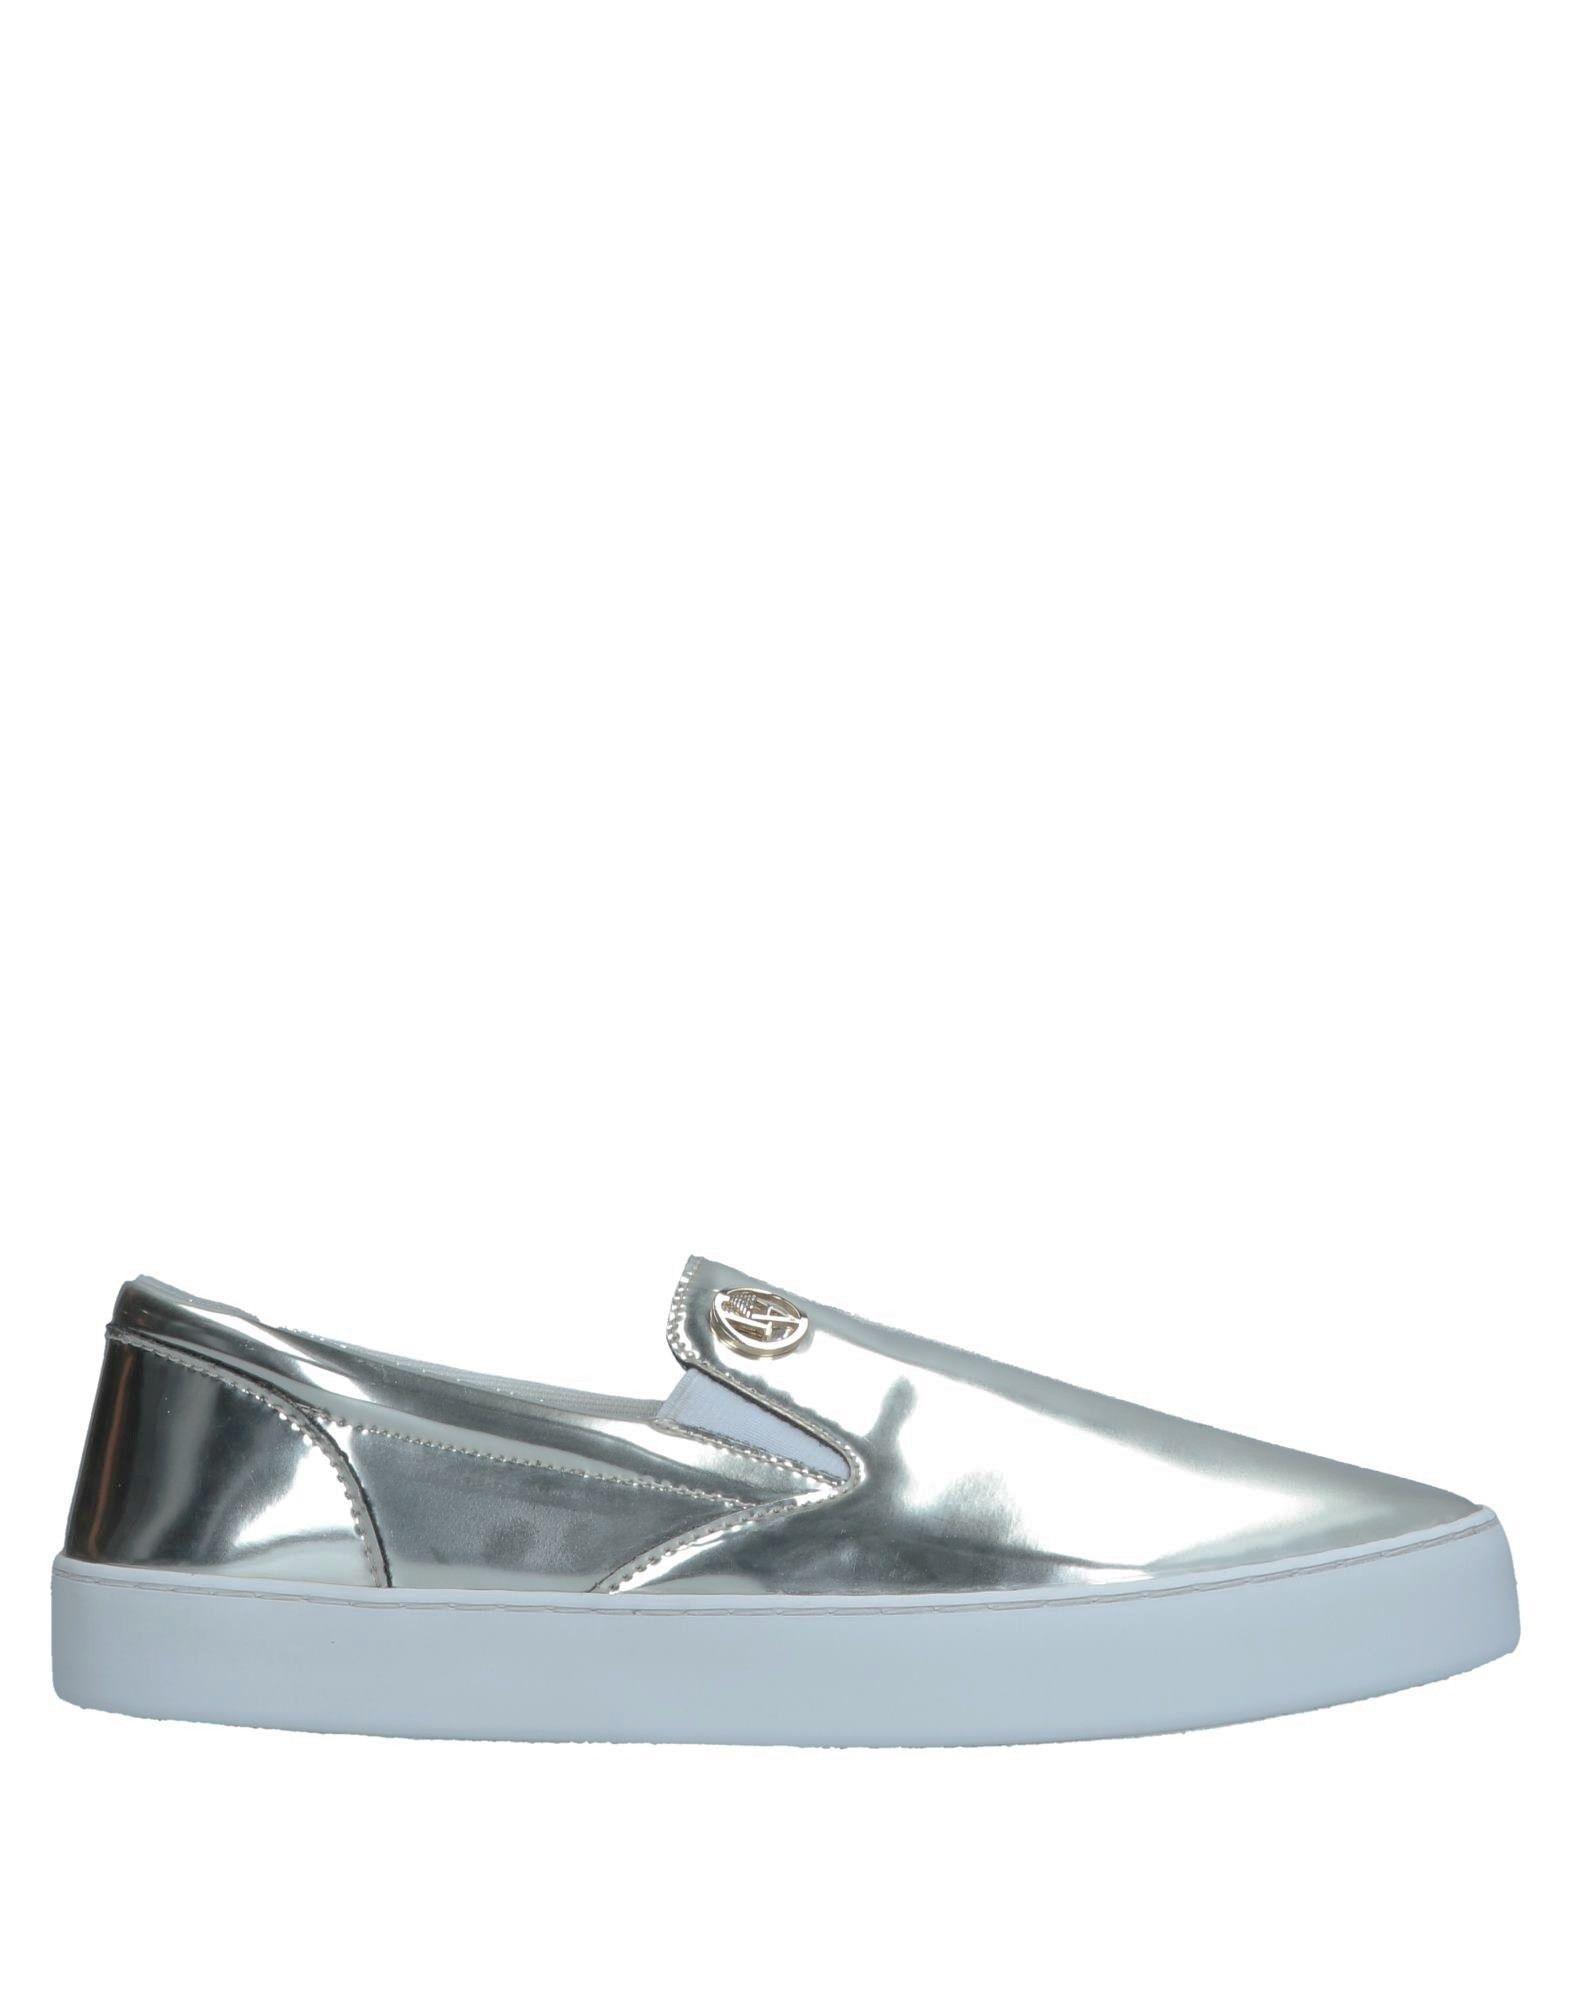 Armani Jeans Sneakers Damen  11544329PJ Gute Qualität beliebte Schuhe